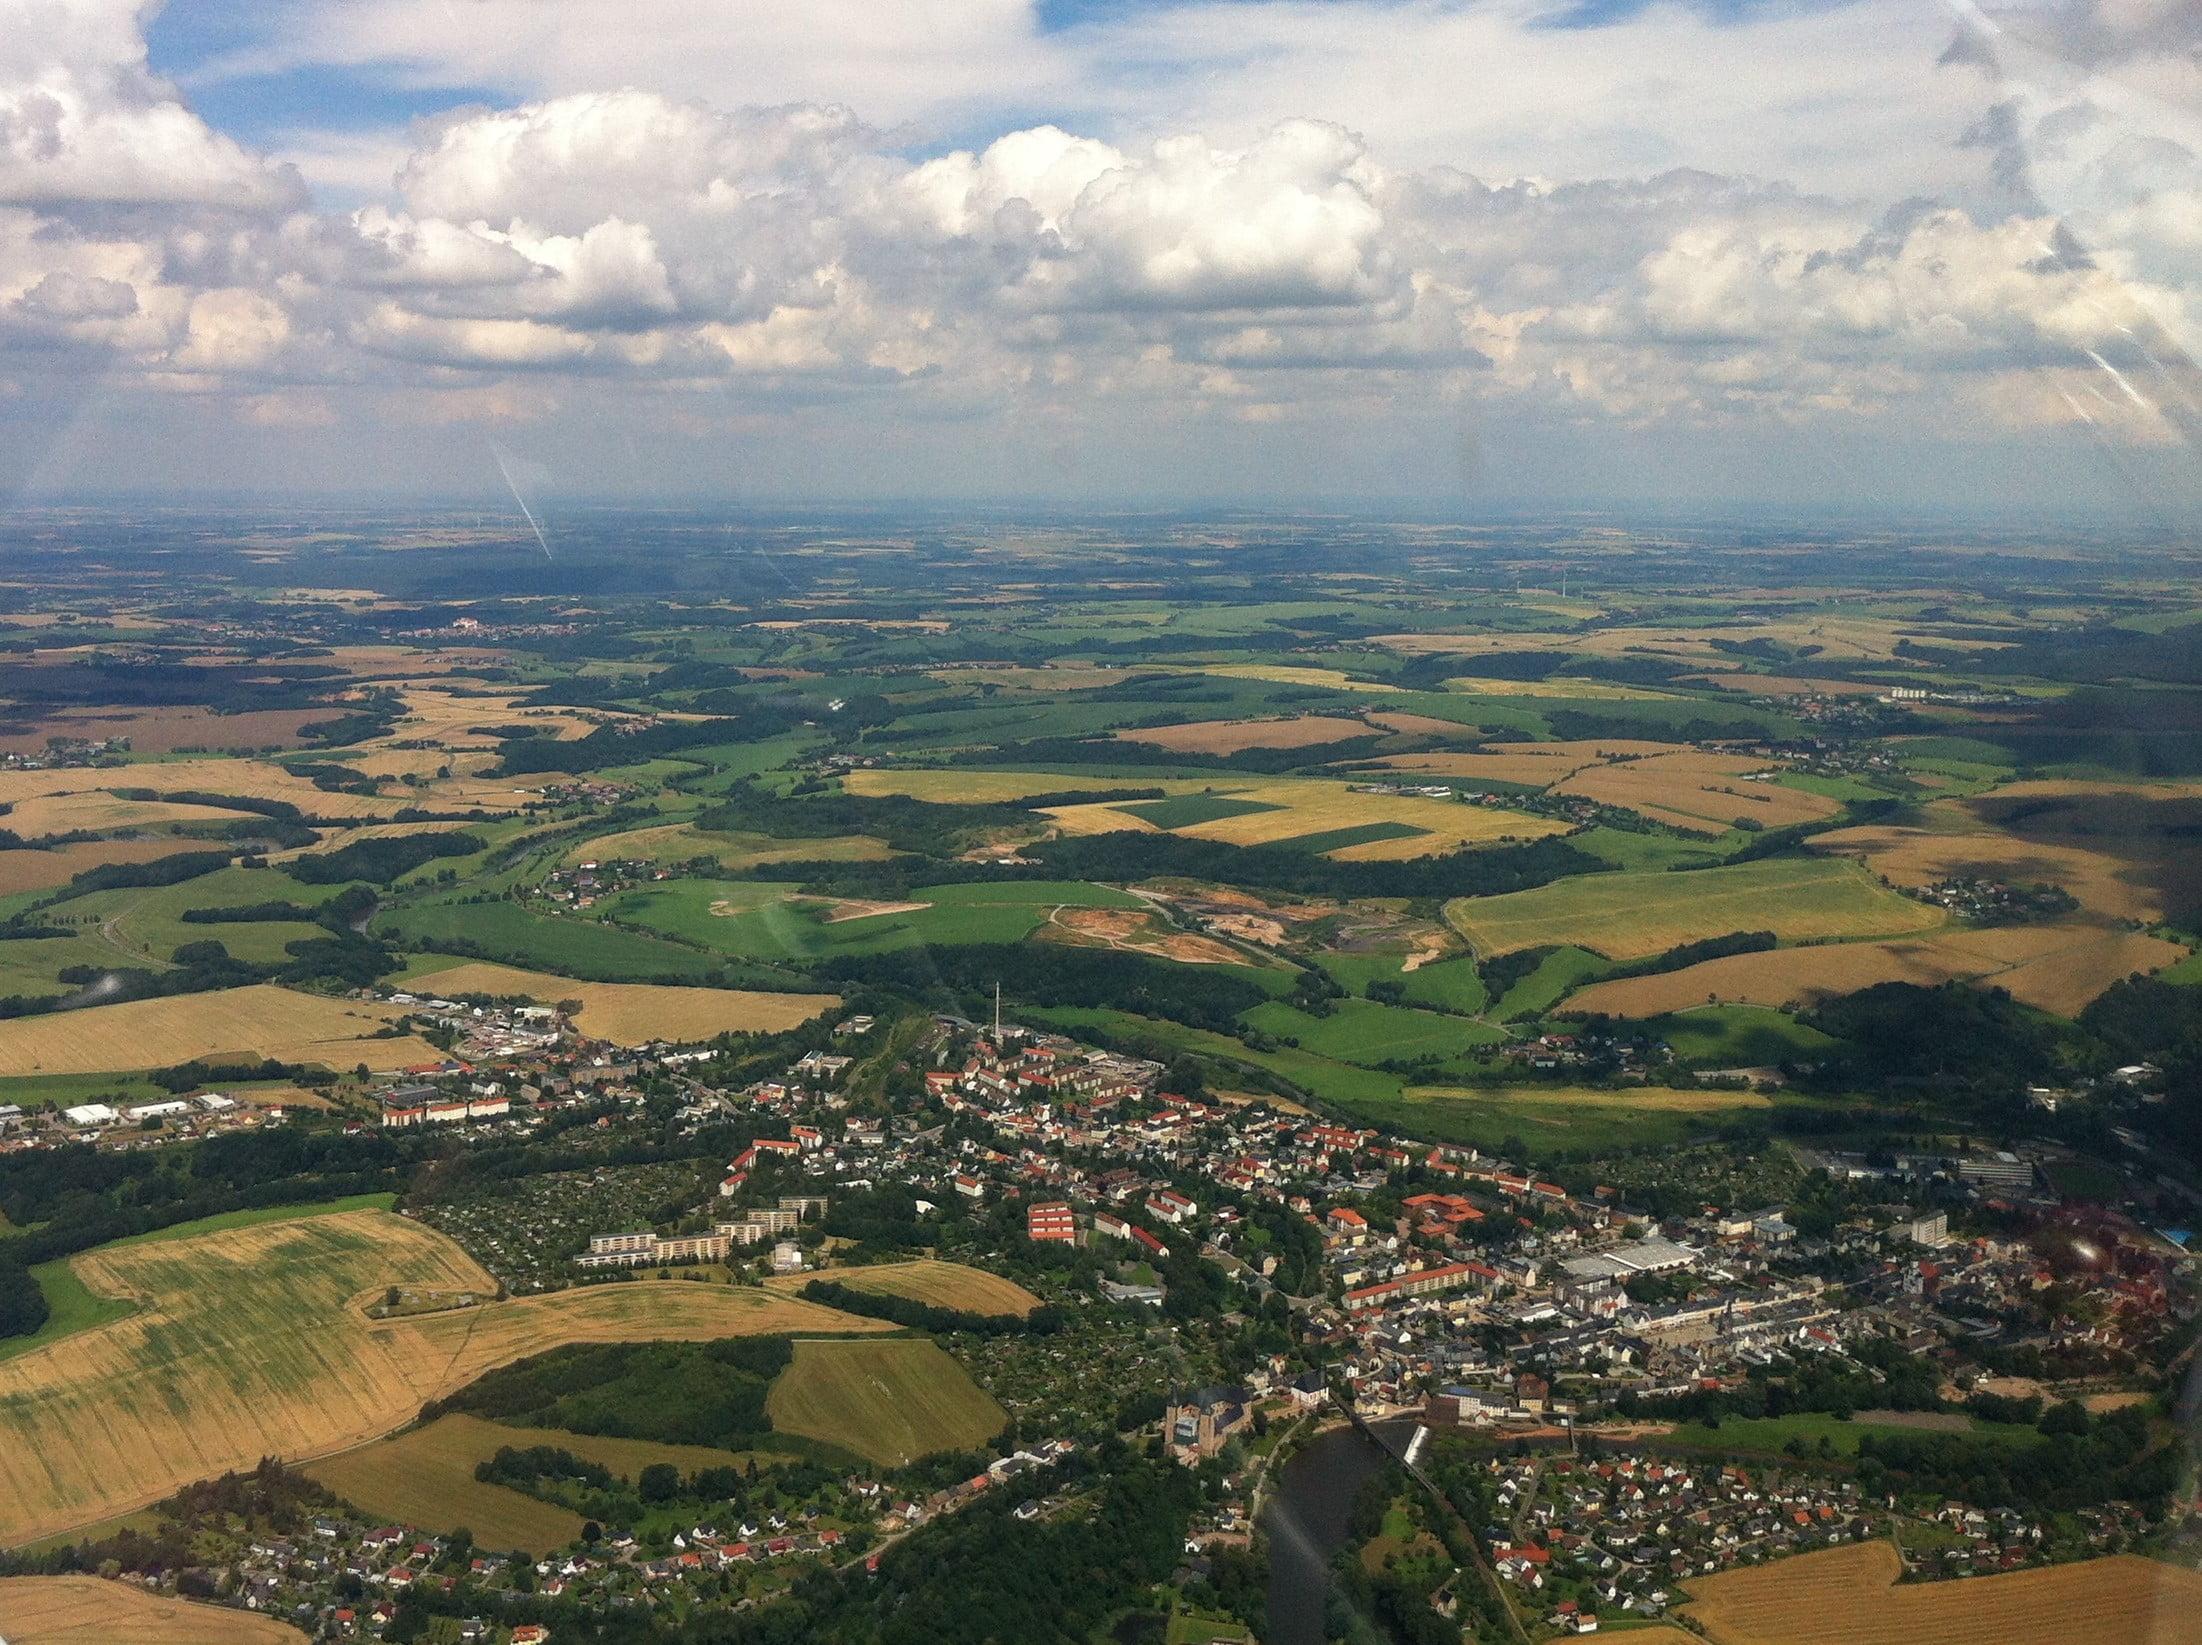 Rundflug über Rochlitz